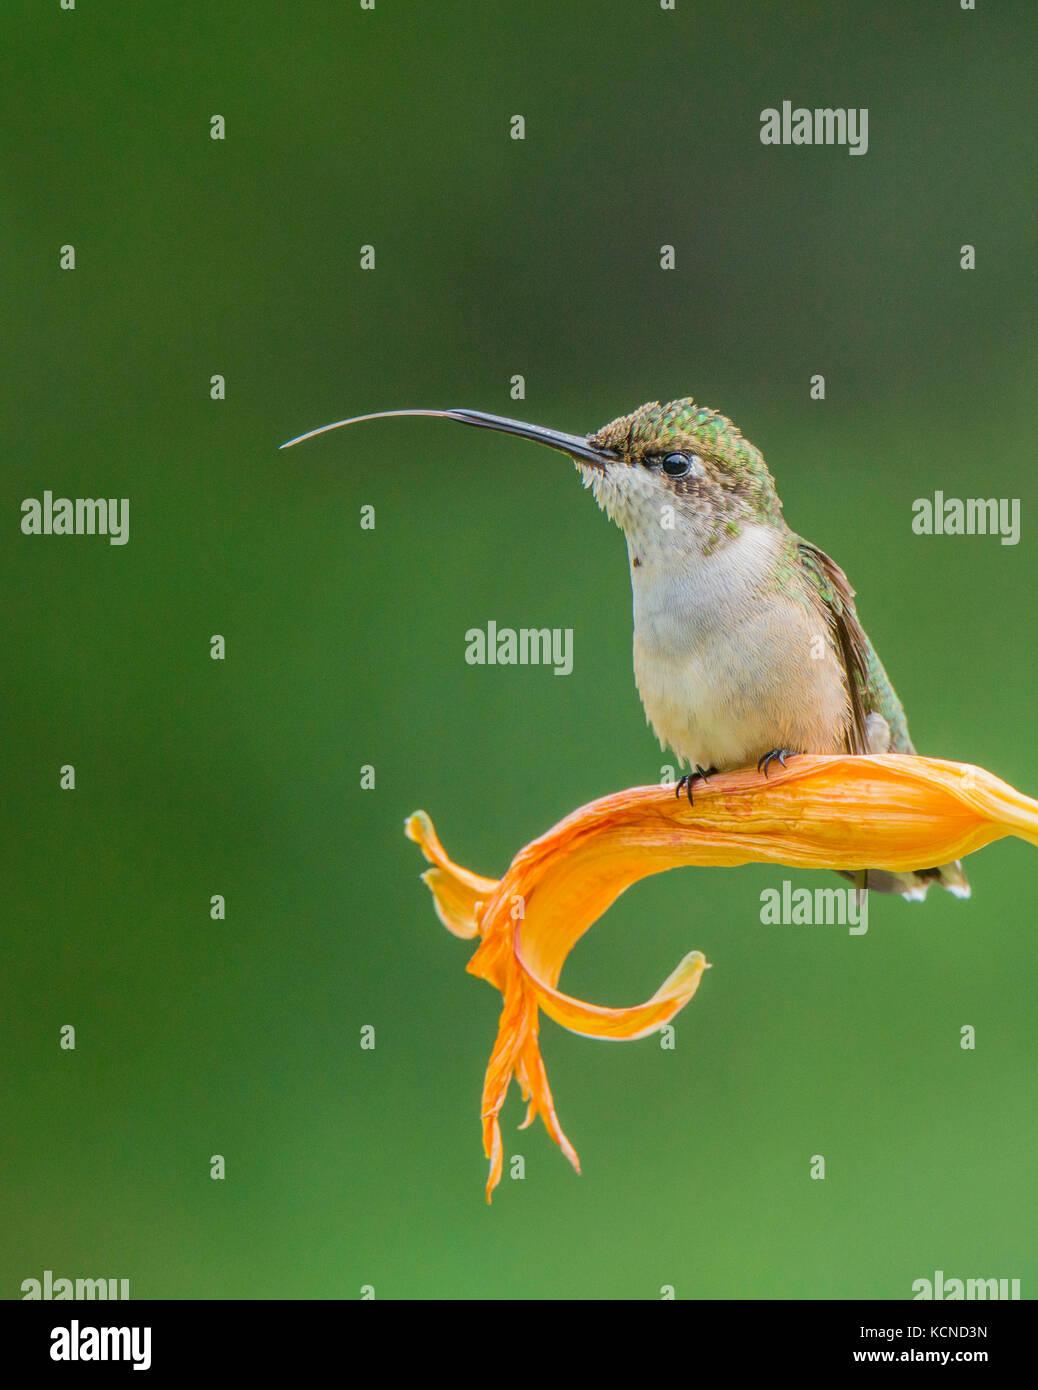 Immature Male Ruby-throated hummingbird, Archilochus colubris, Ontario, Canada Stock Photo